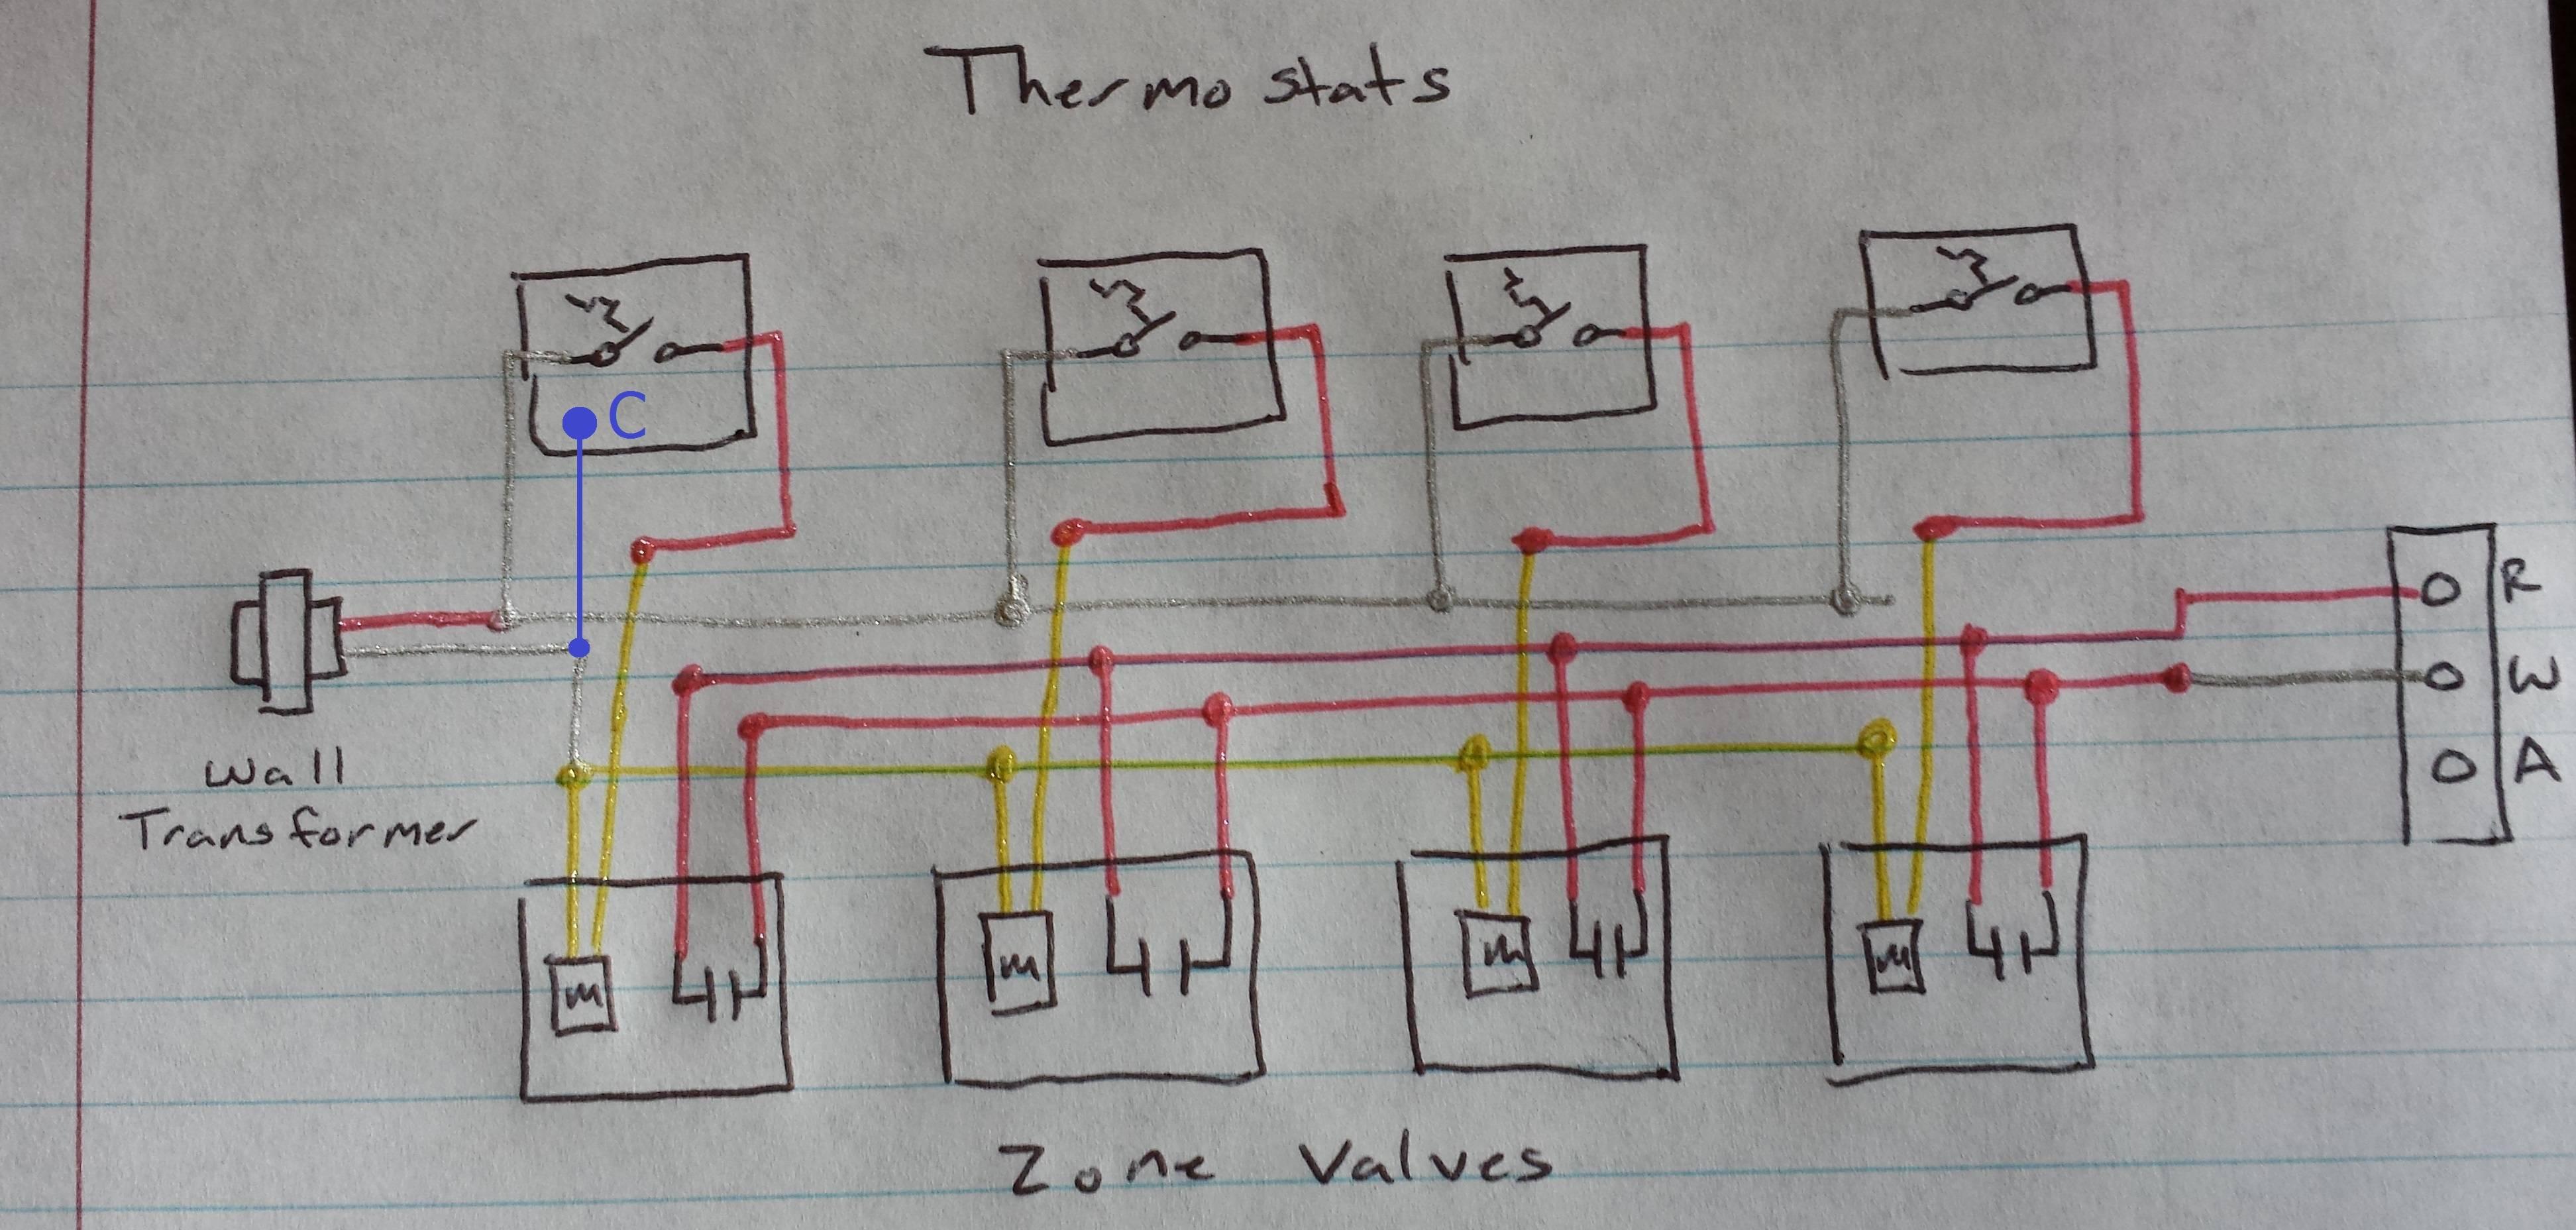 Peachy Low Voltage Thermostat Wiring Diagram Wiring Diagram Tutorial Wiring Cloud Hisonepsysticxongrecoveryedborg